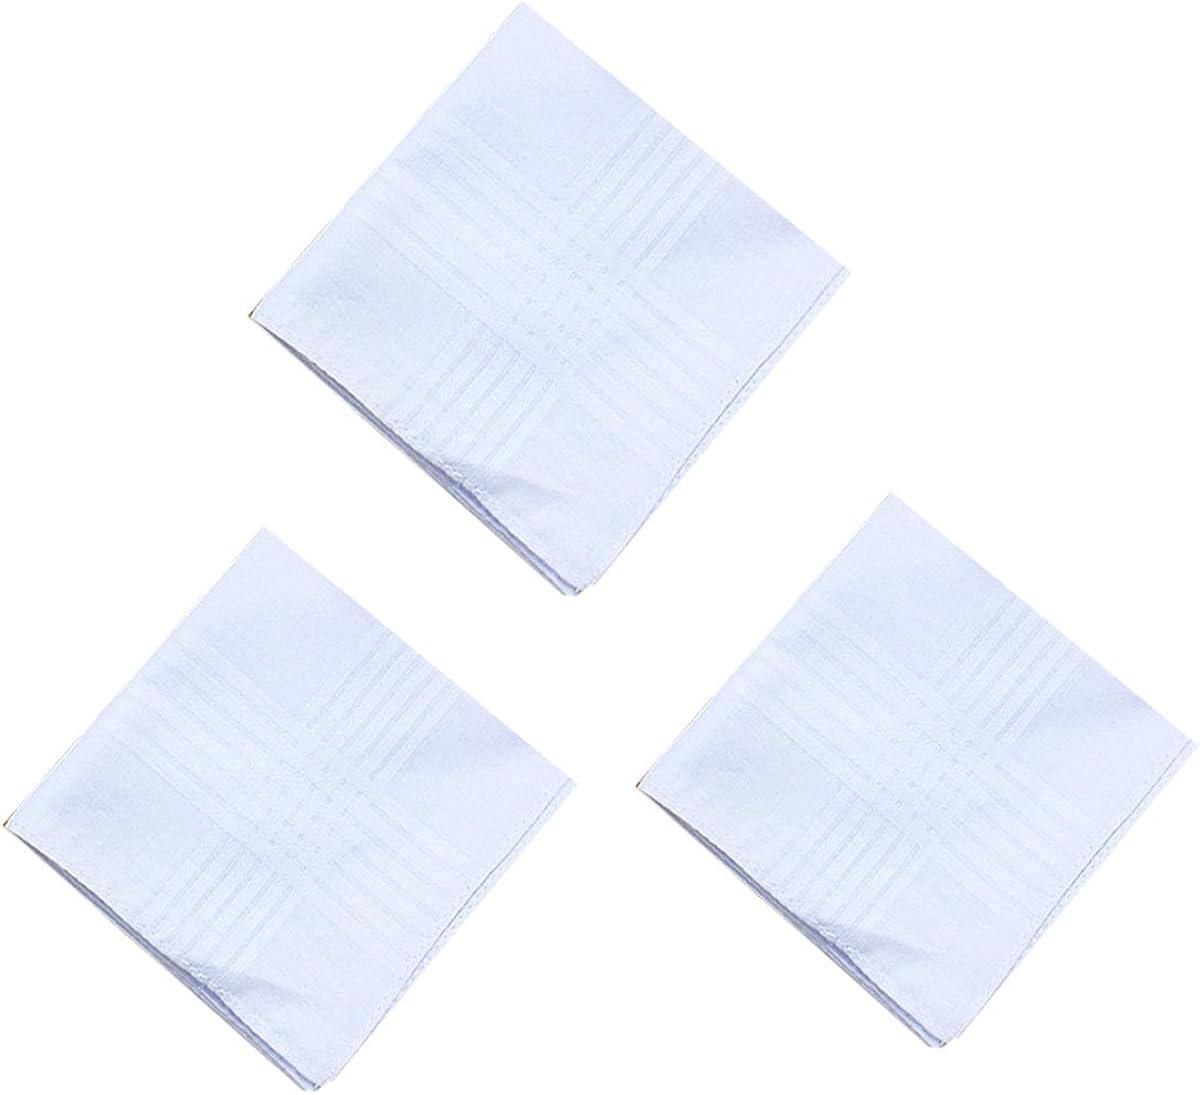 6 Strips Border STyle Mens White Cotton Handkerchiefs Pack